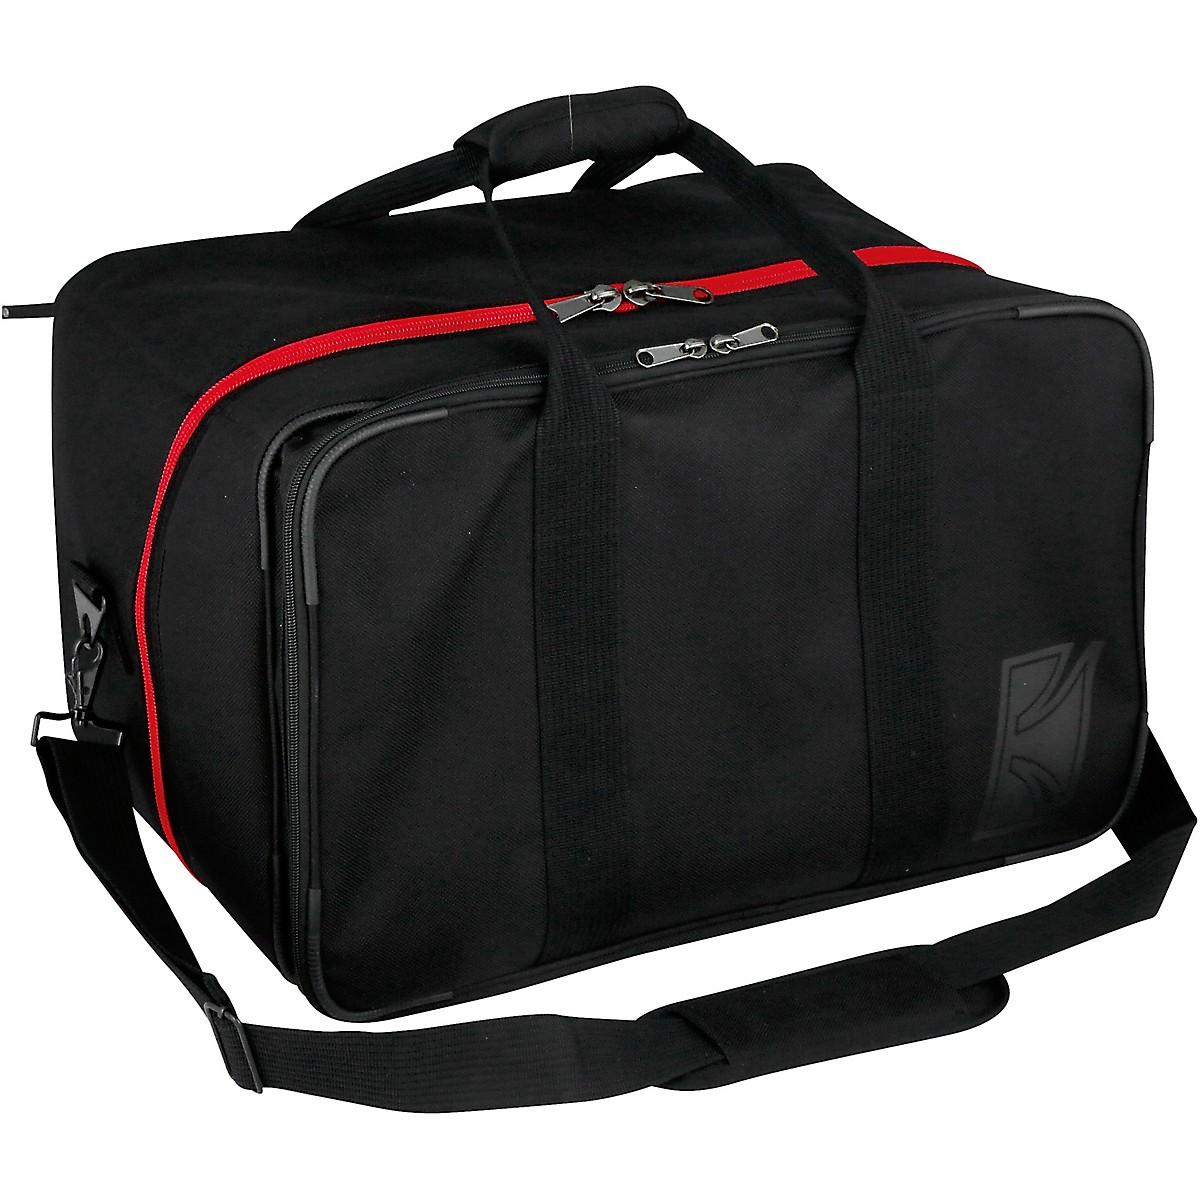 TAMA Standard Series Cajon Bag